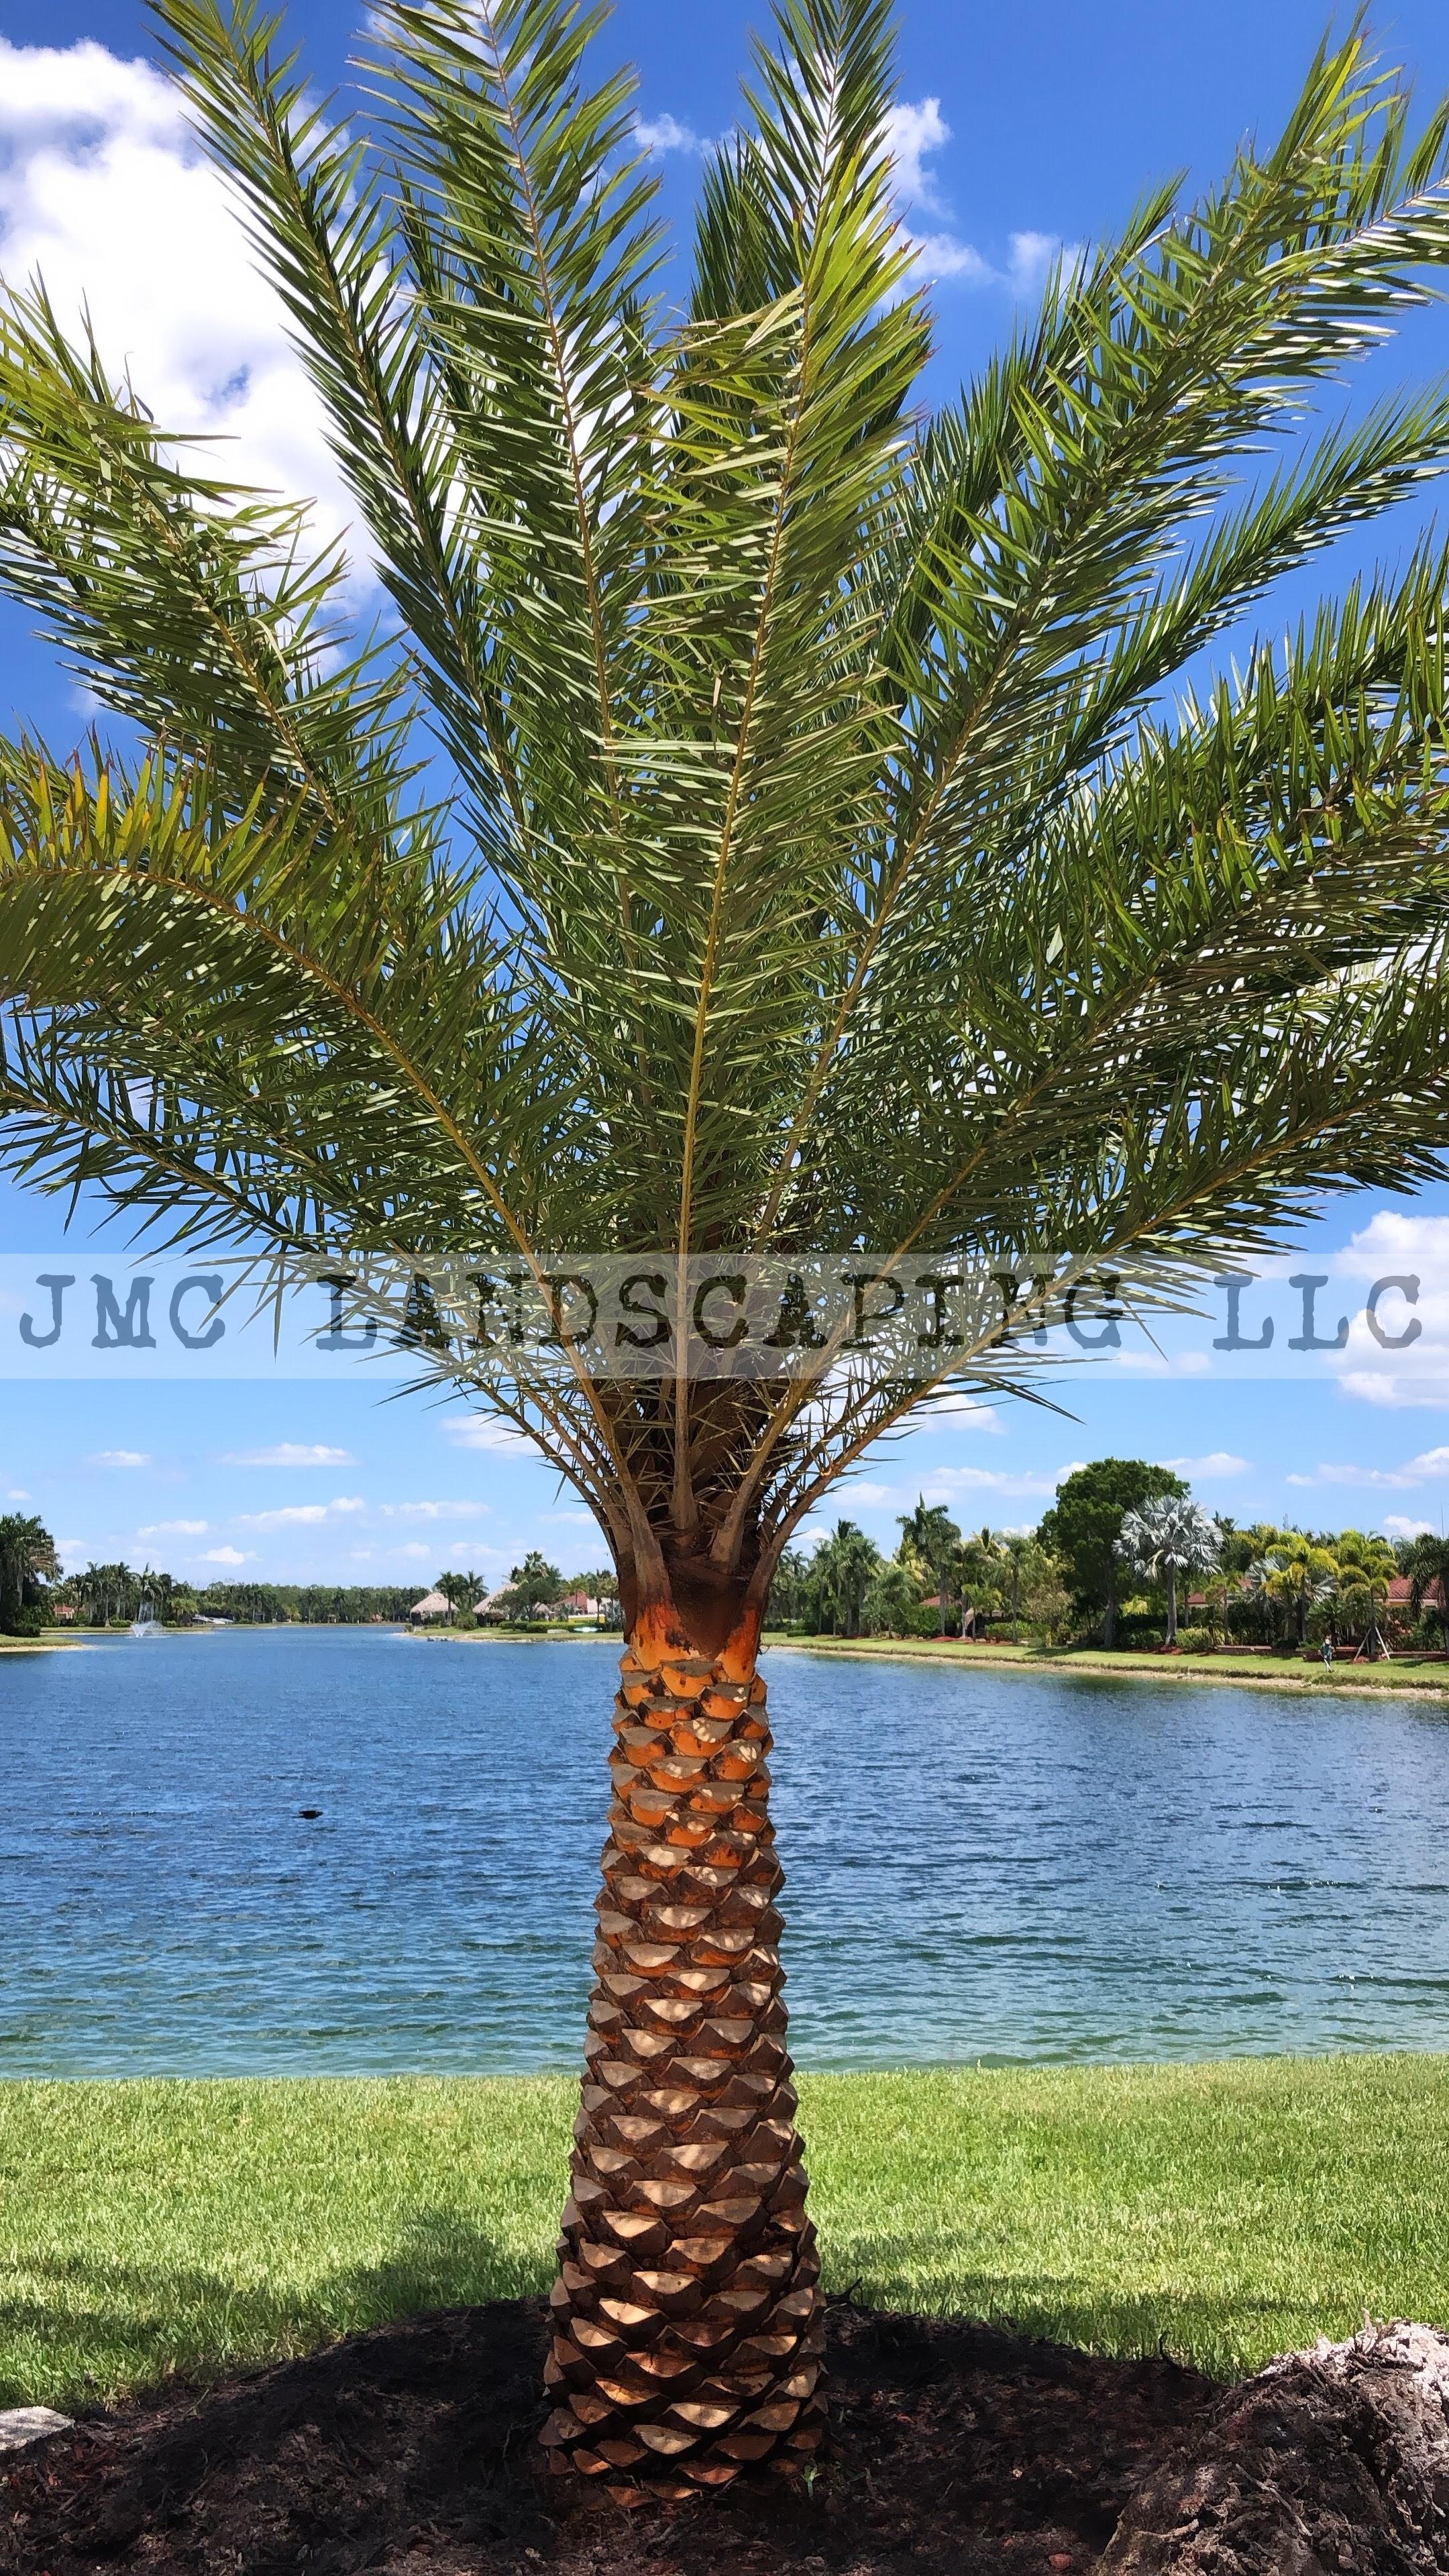 Sylvestris Palm with diamond cut